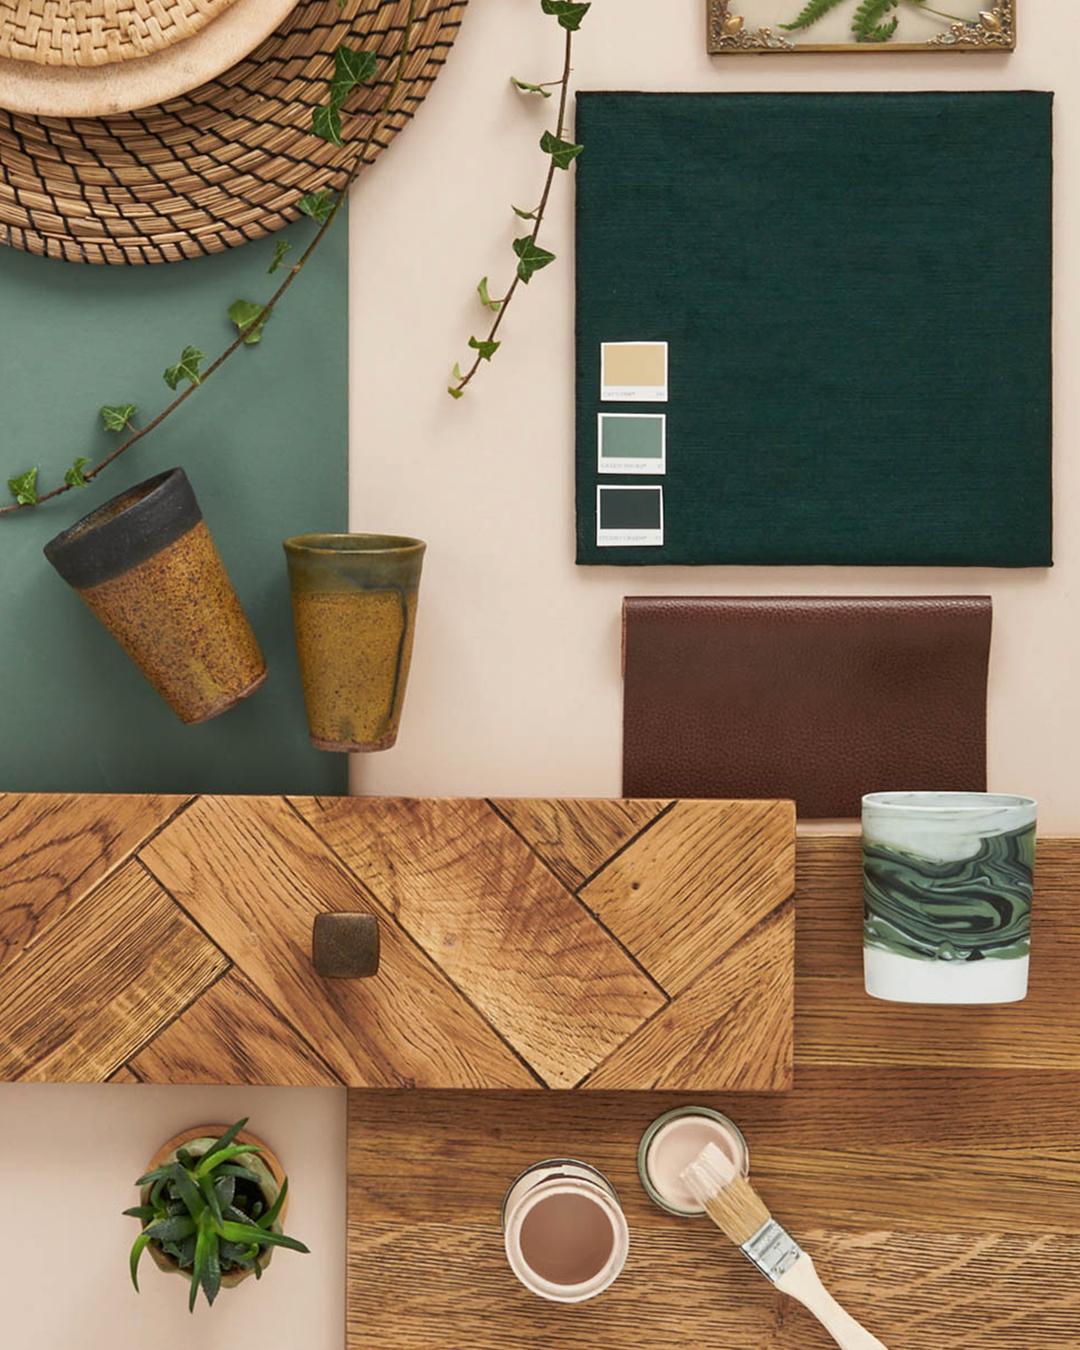 Our favourite 2021 interior design trends